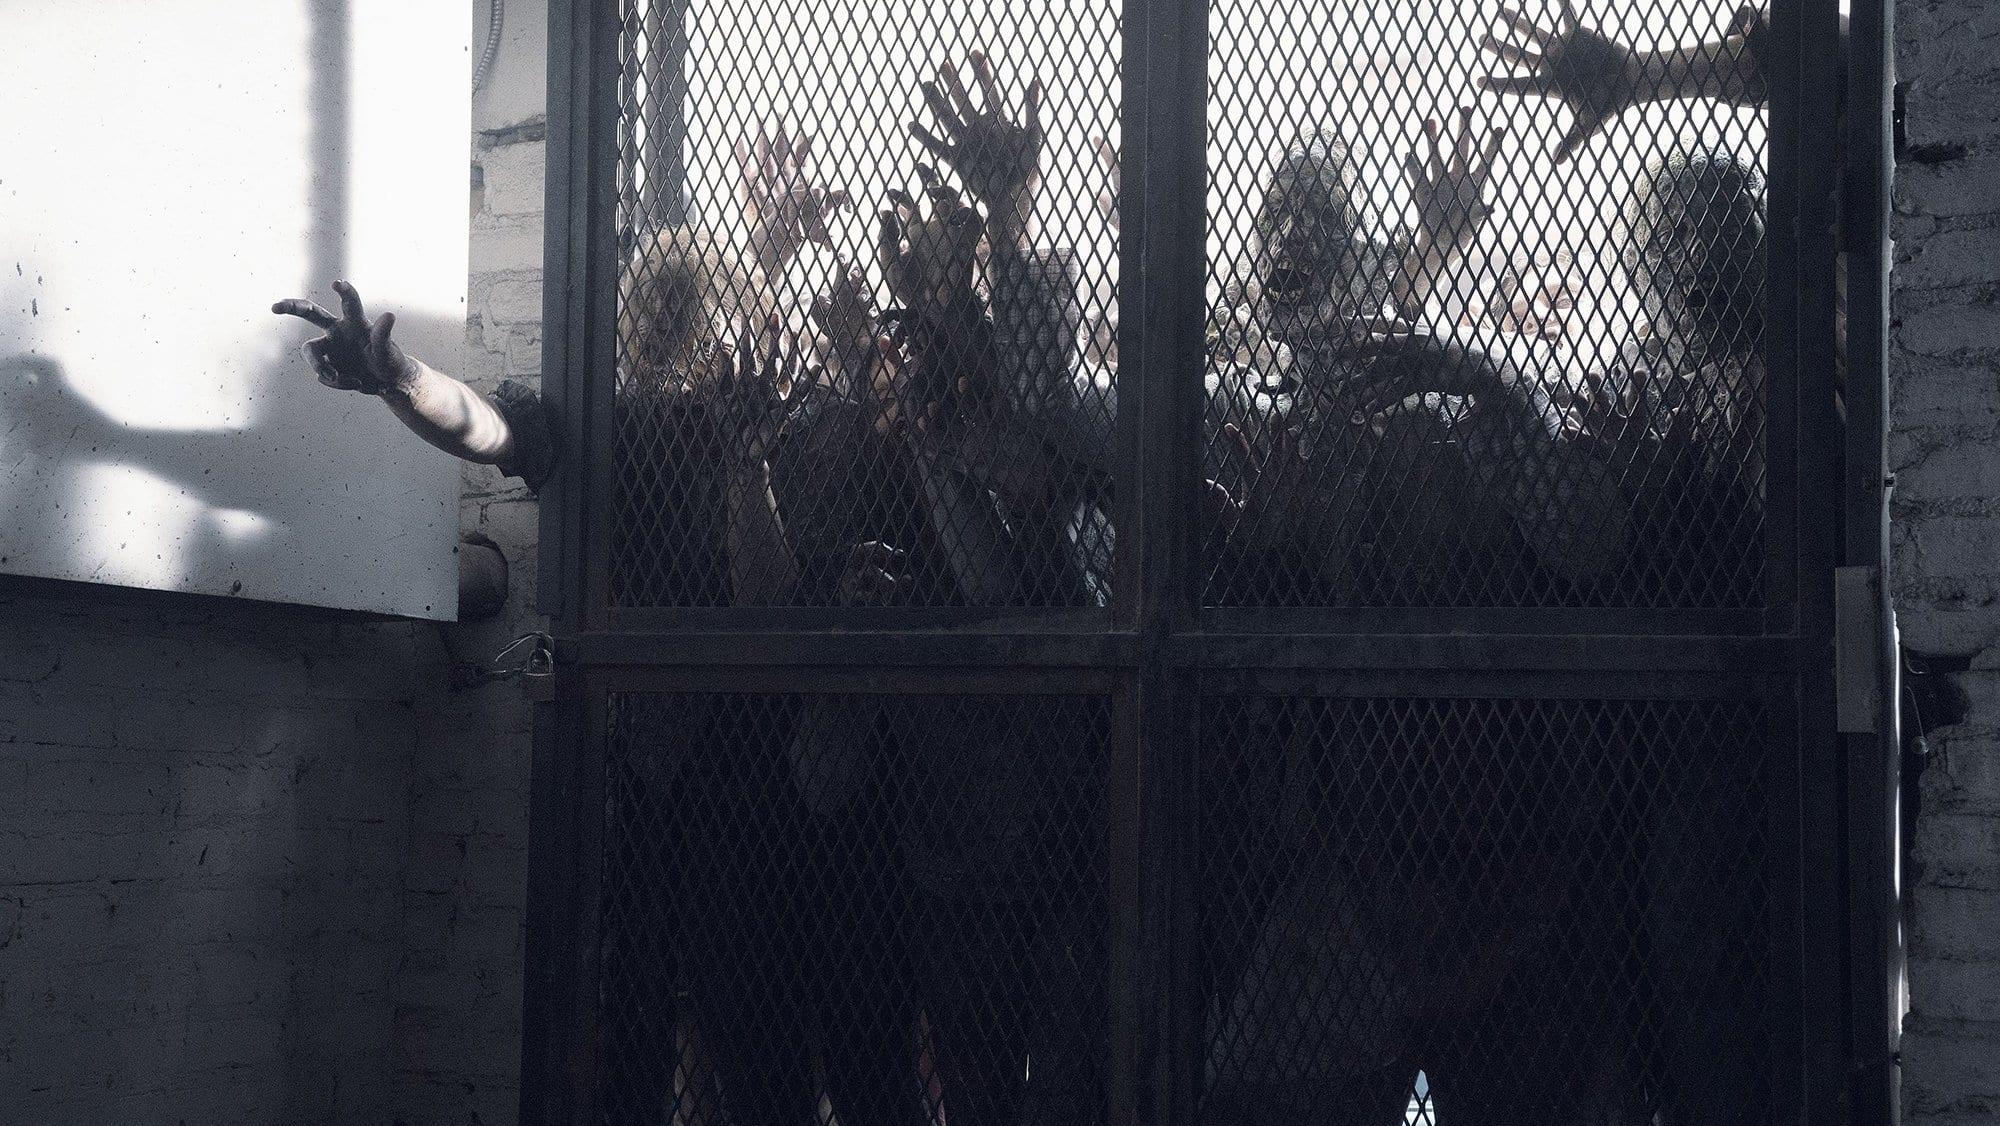 ftwds04e16a Review: Fear the Walking Dead S04E16 - ... I Lose Myself